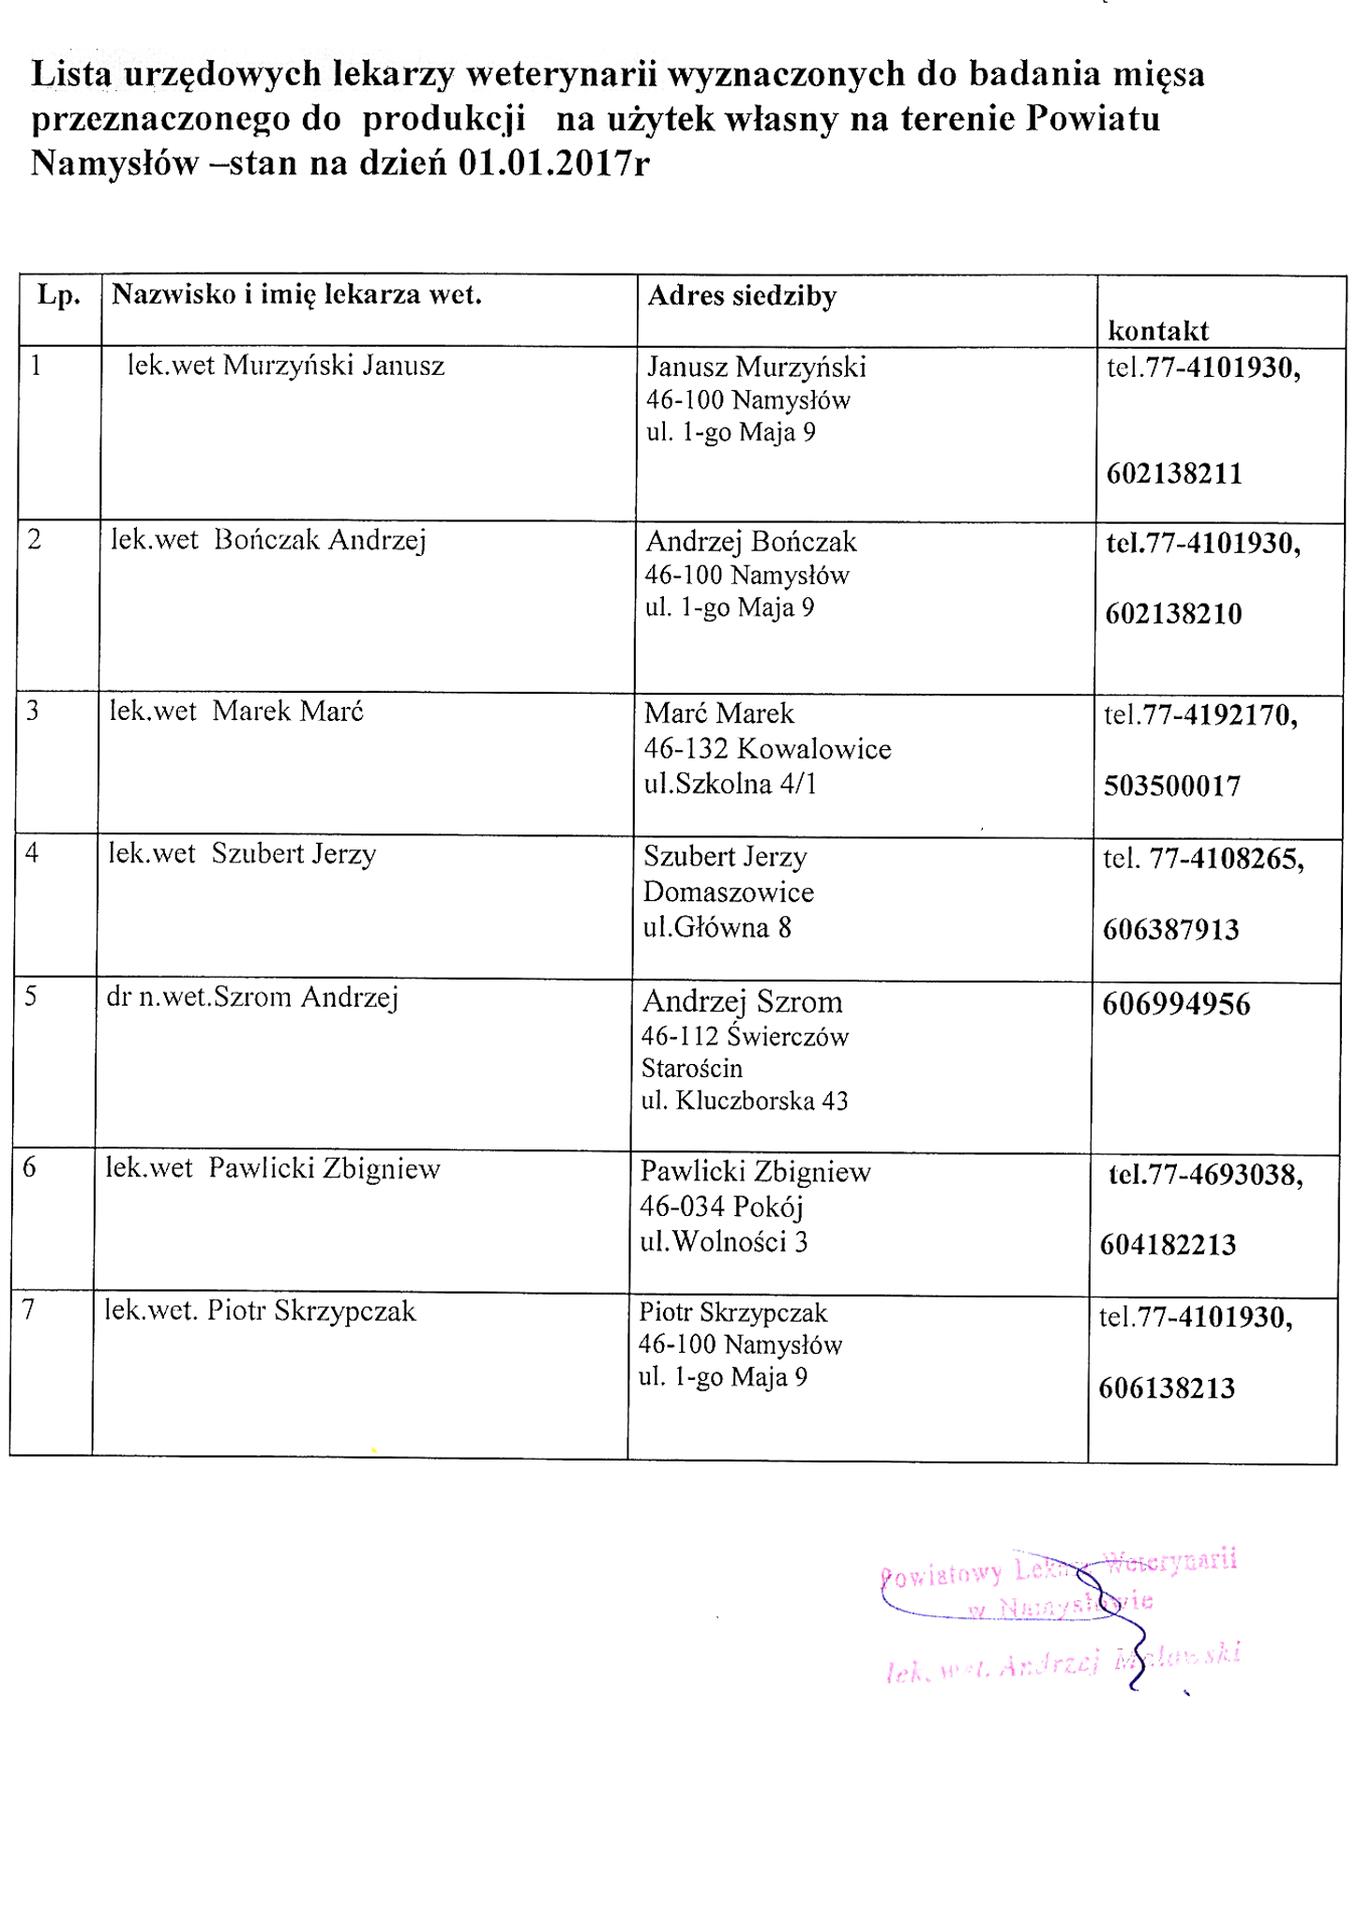 Lista lekarzy weterynarii_DxO.jpeg